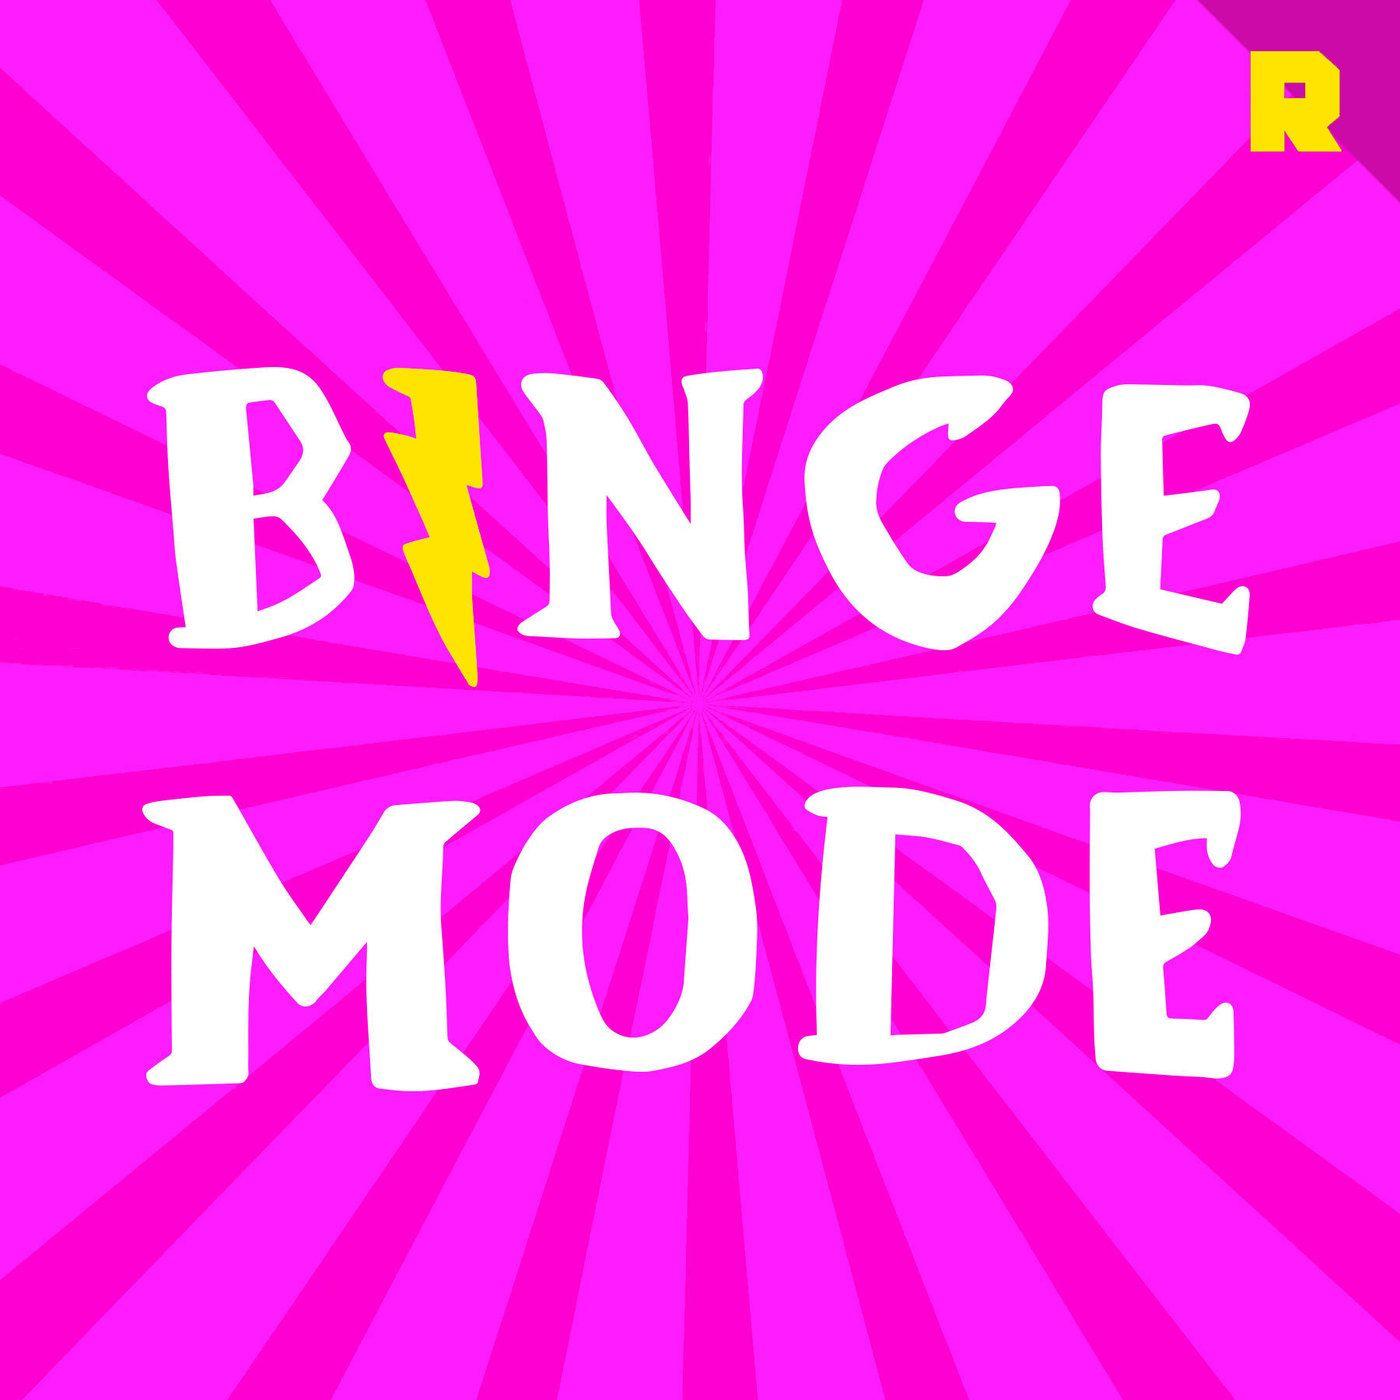 Binge Mode: Weekly